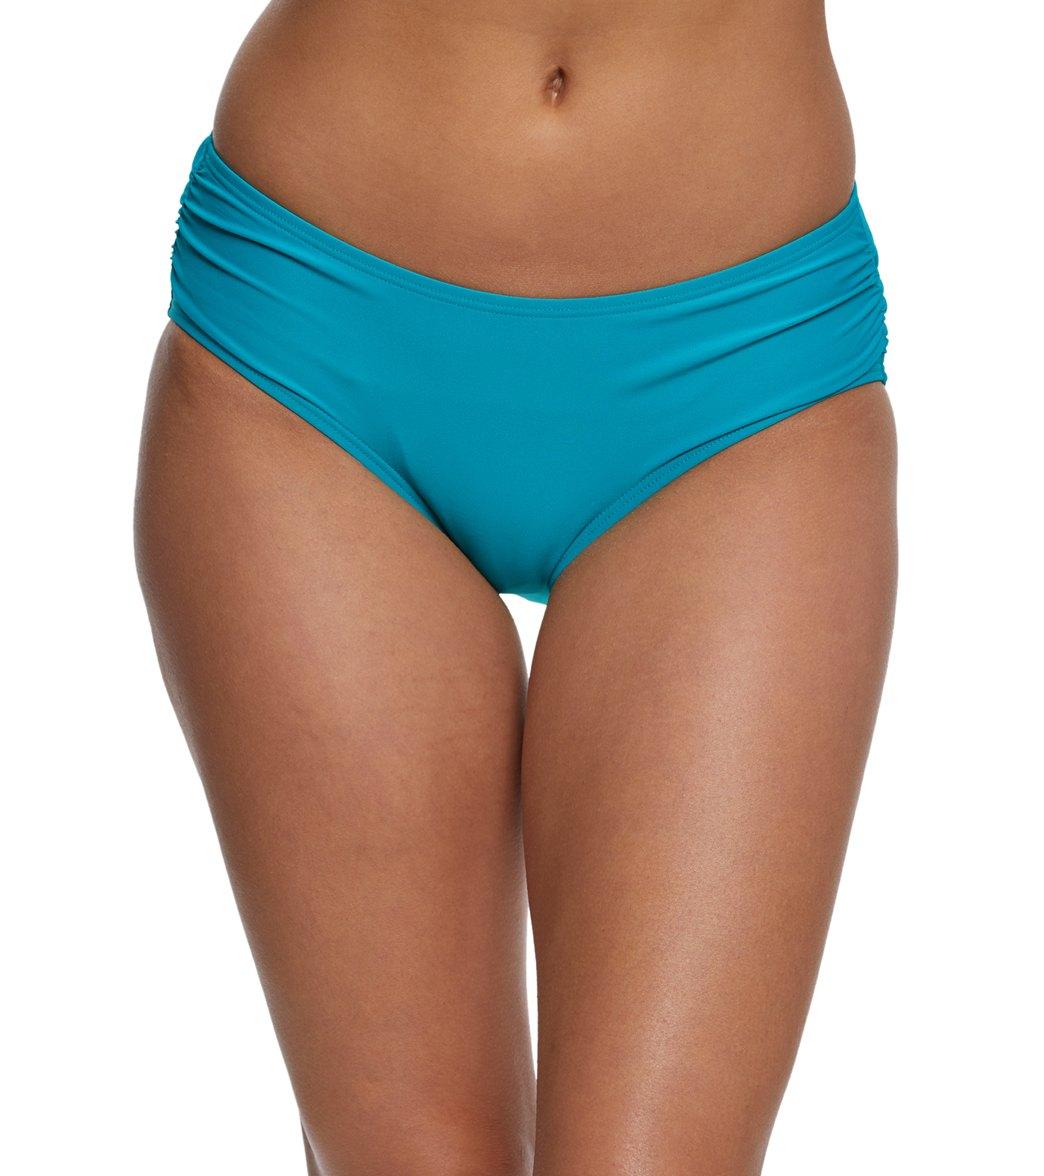 a828420897458 Coco Reef Classic Solid Side Shirred Bikini Bottom at SwimOutlet.com